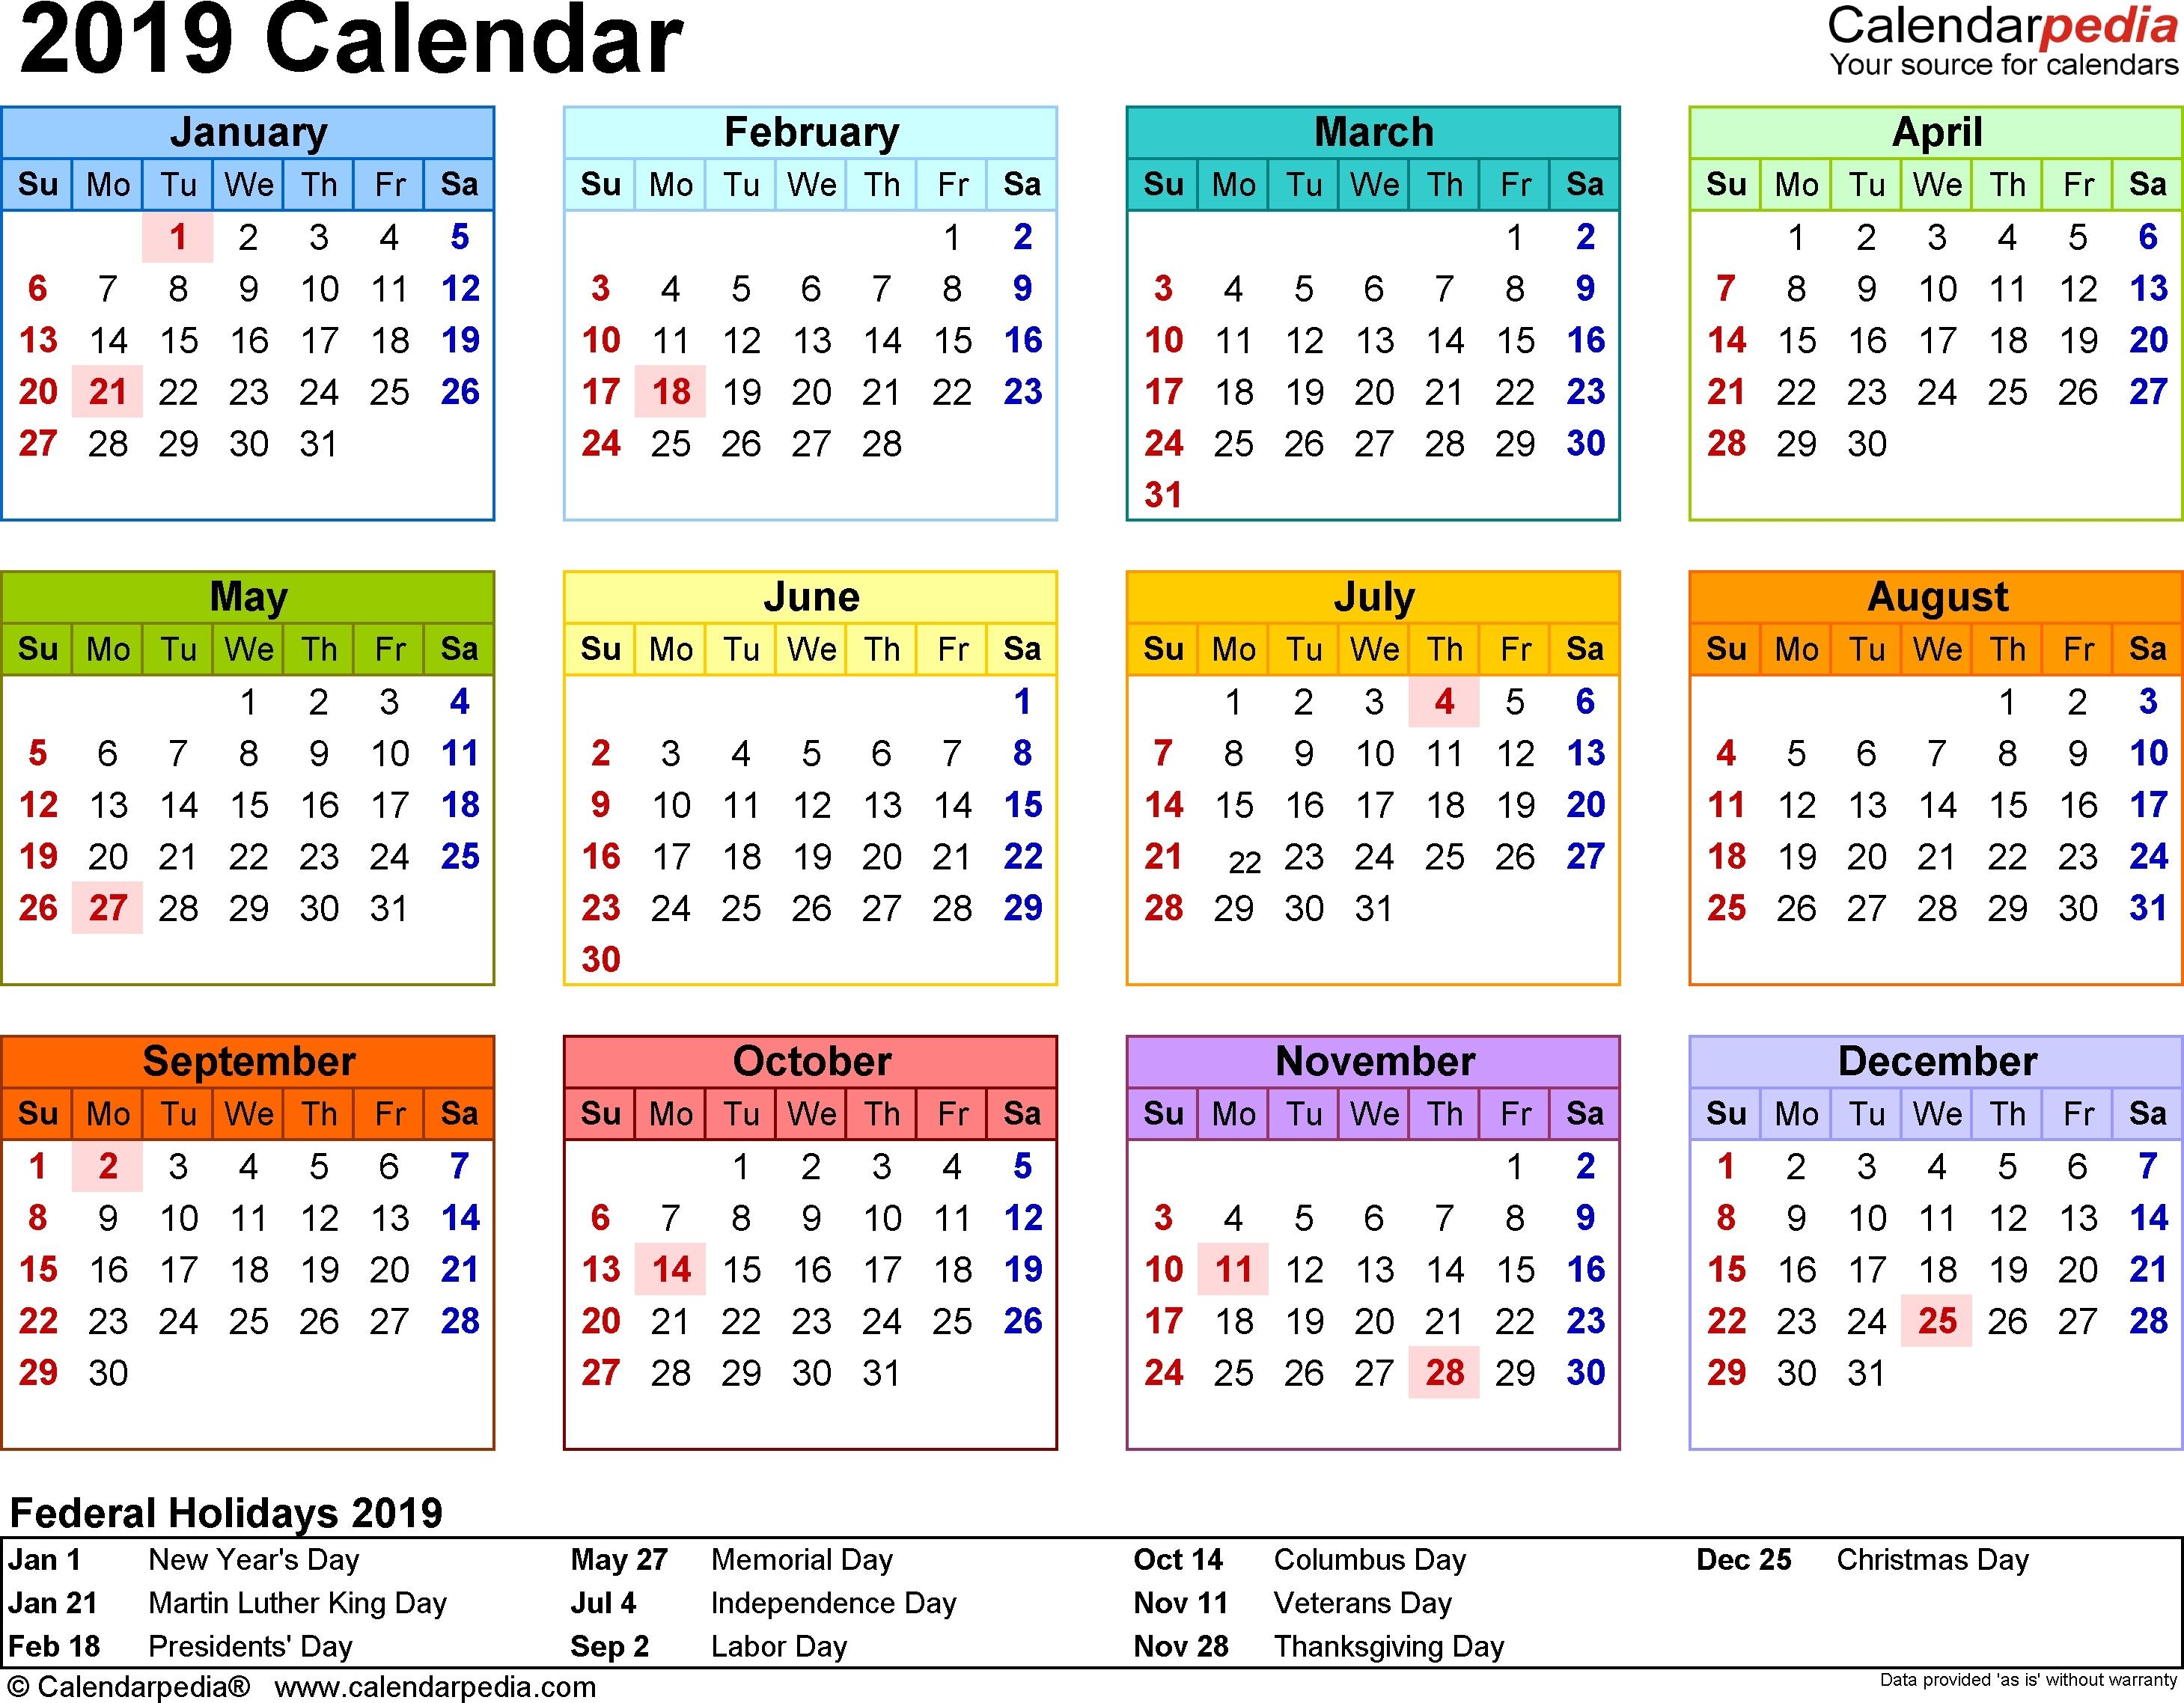 Incredible 2020 Calendar South African Public Holidays-2020 Calendar South Africa With Public Holidays And School Terms